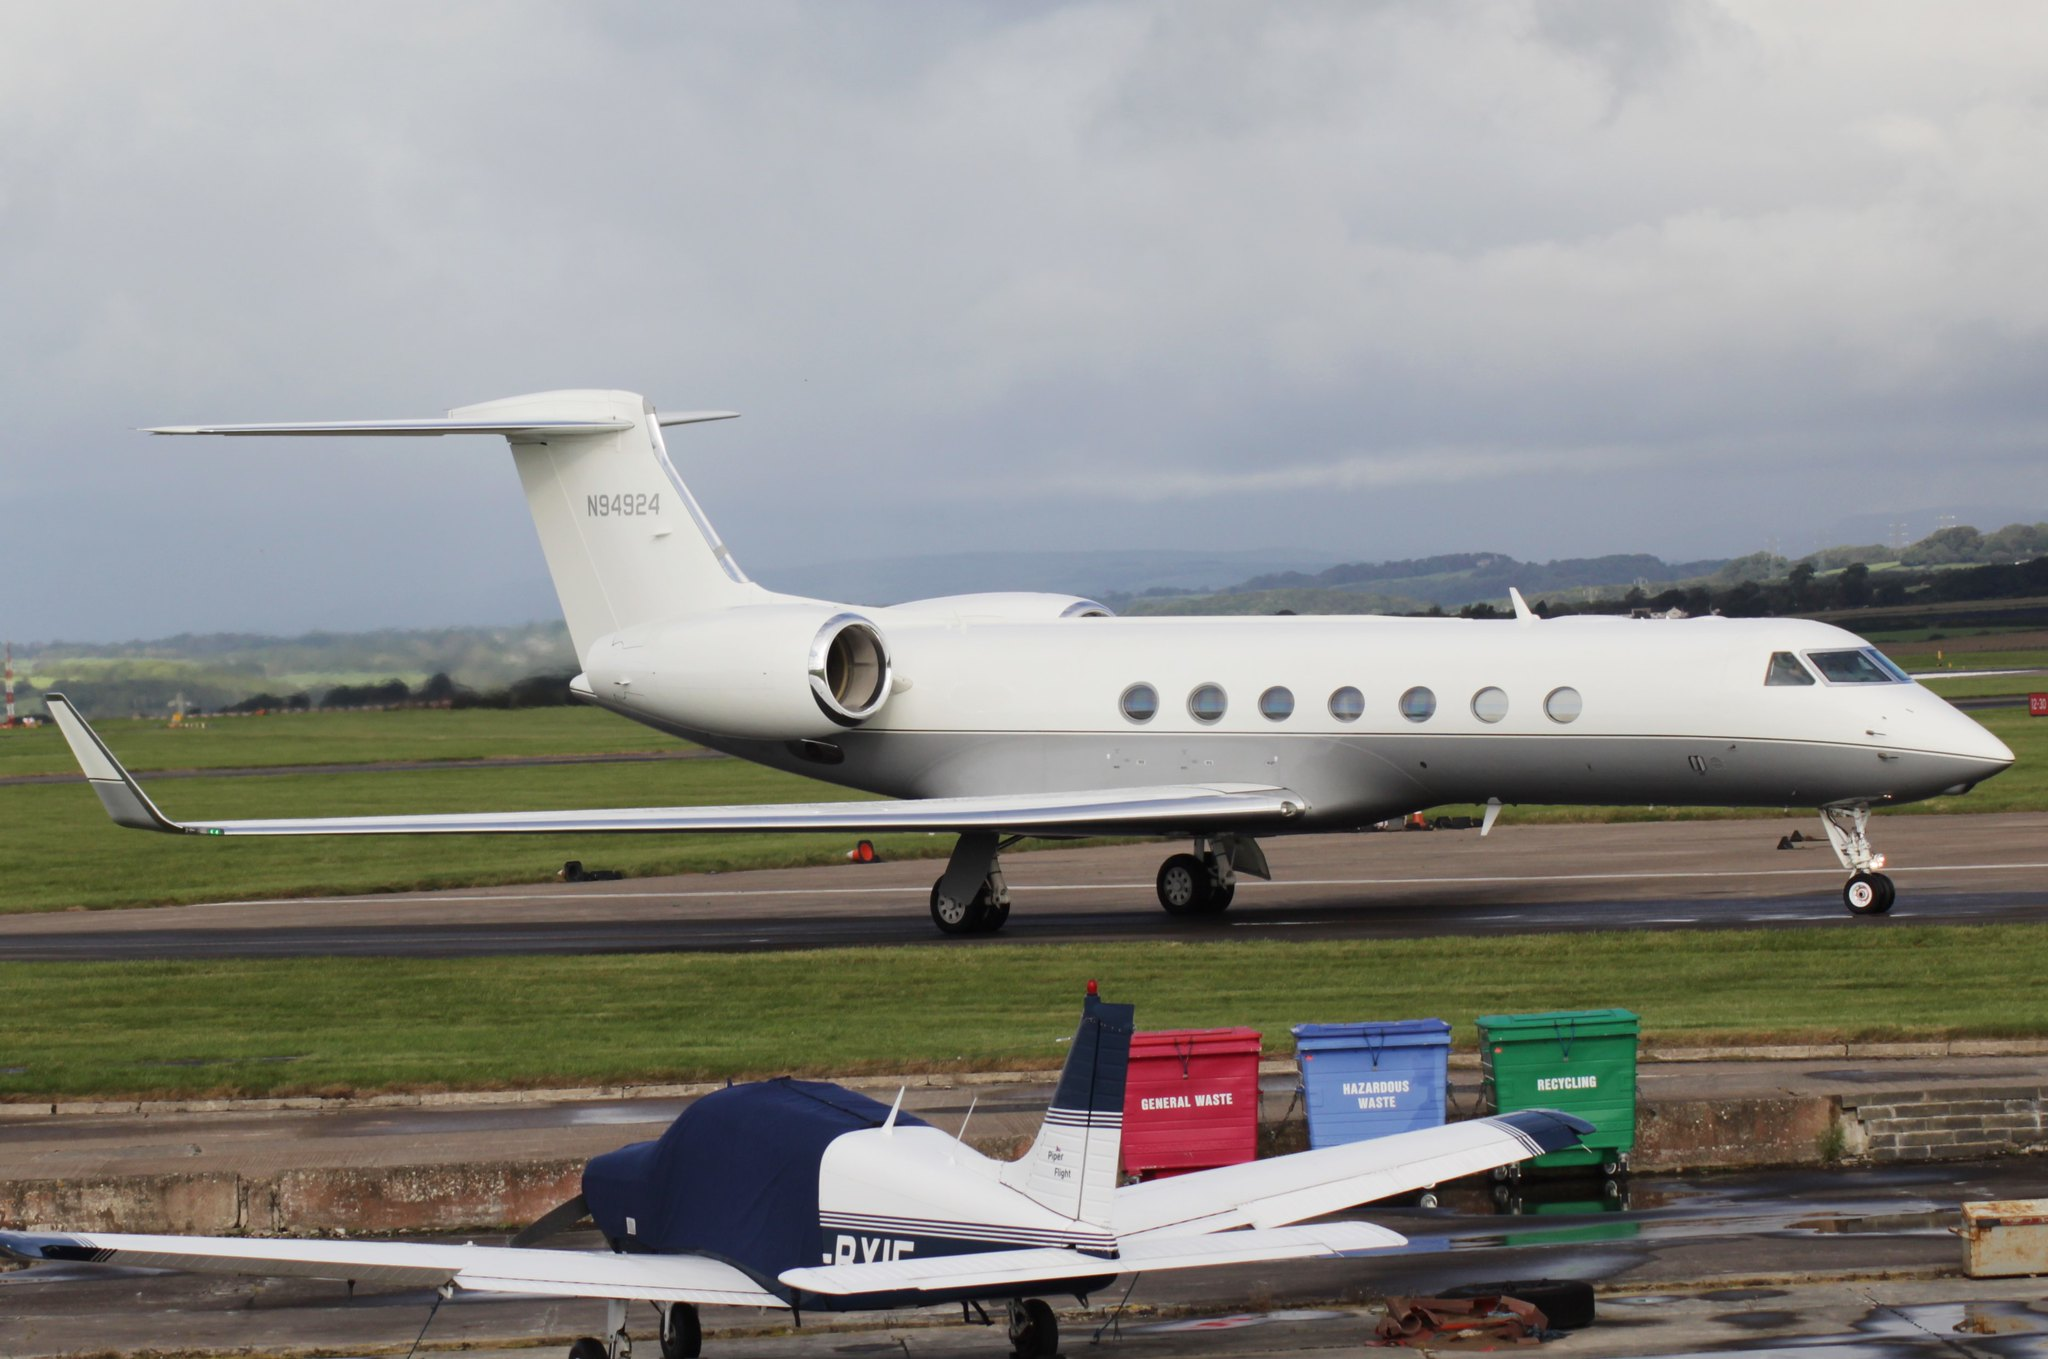 Gulfstream G550 N94924 01OCT16